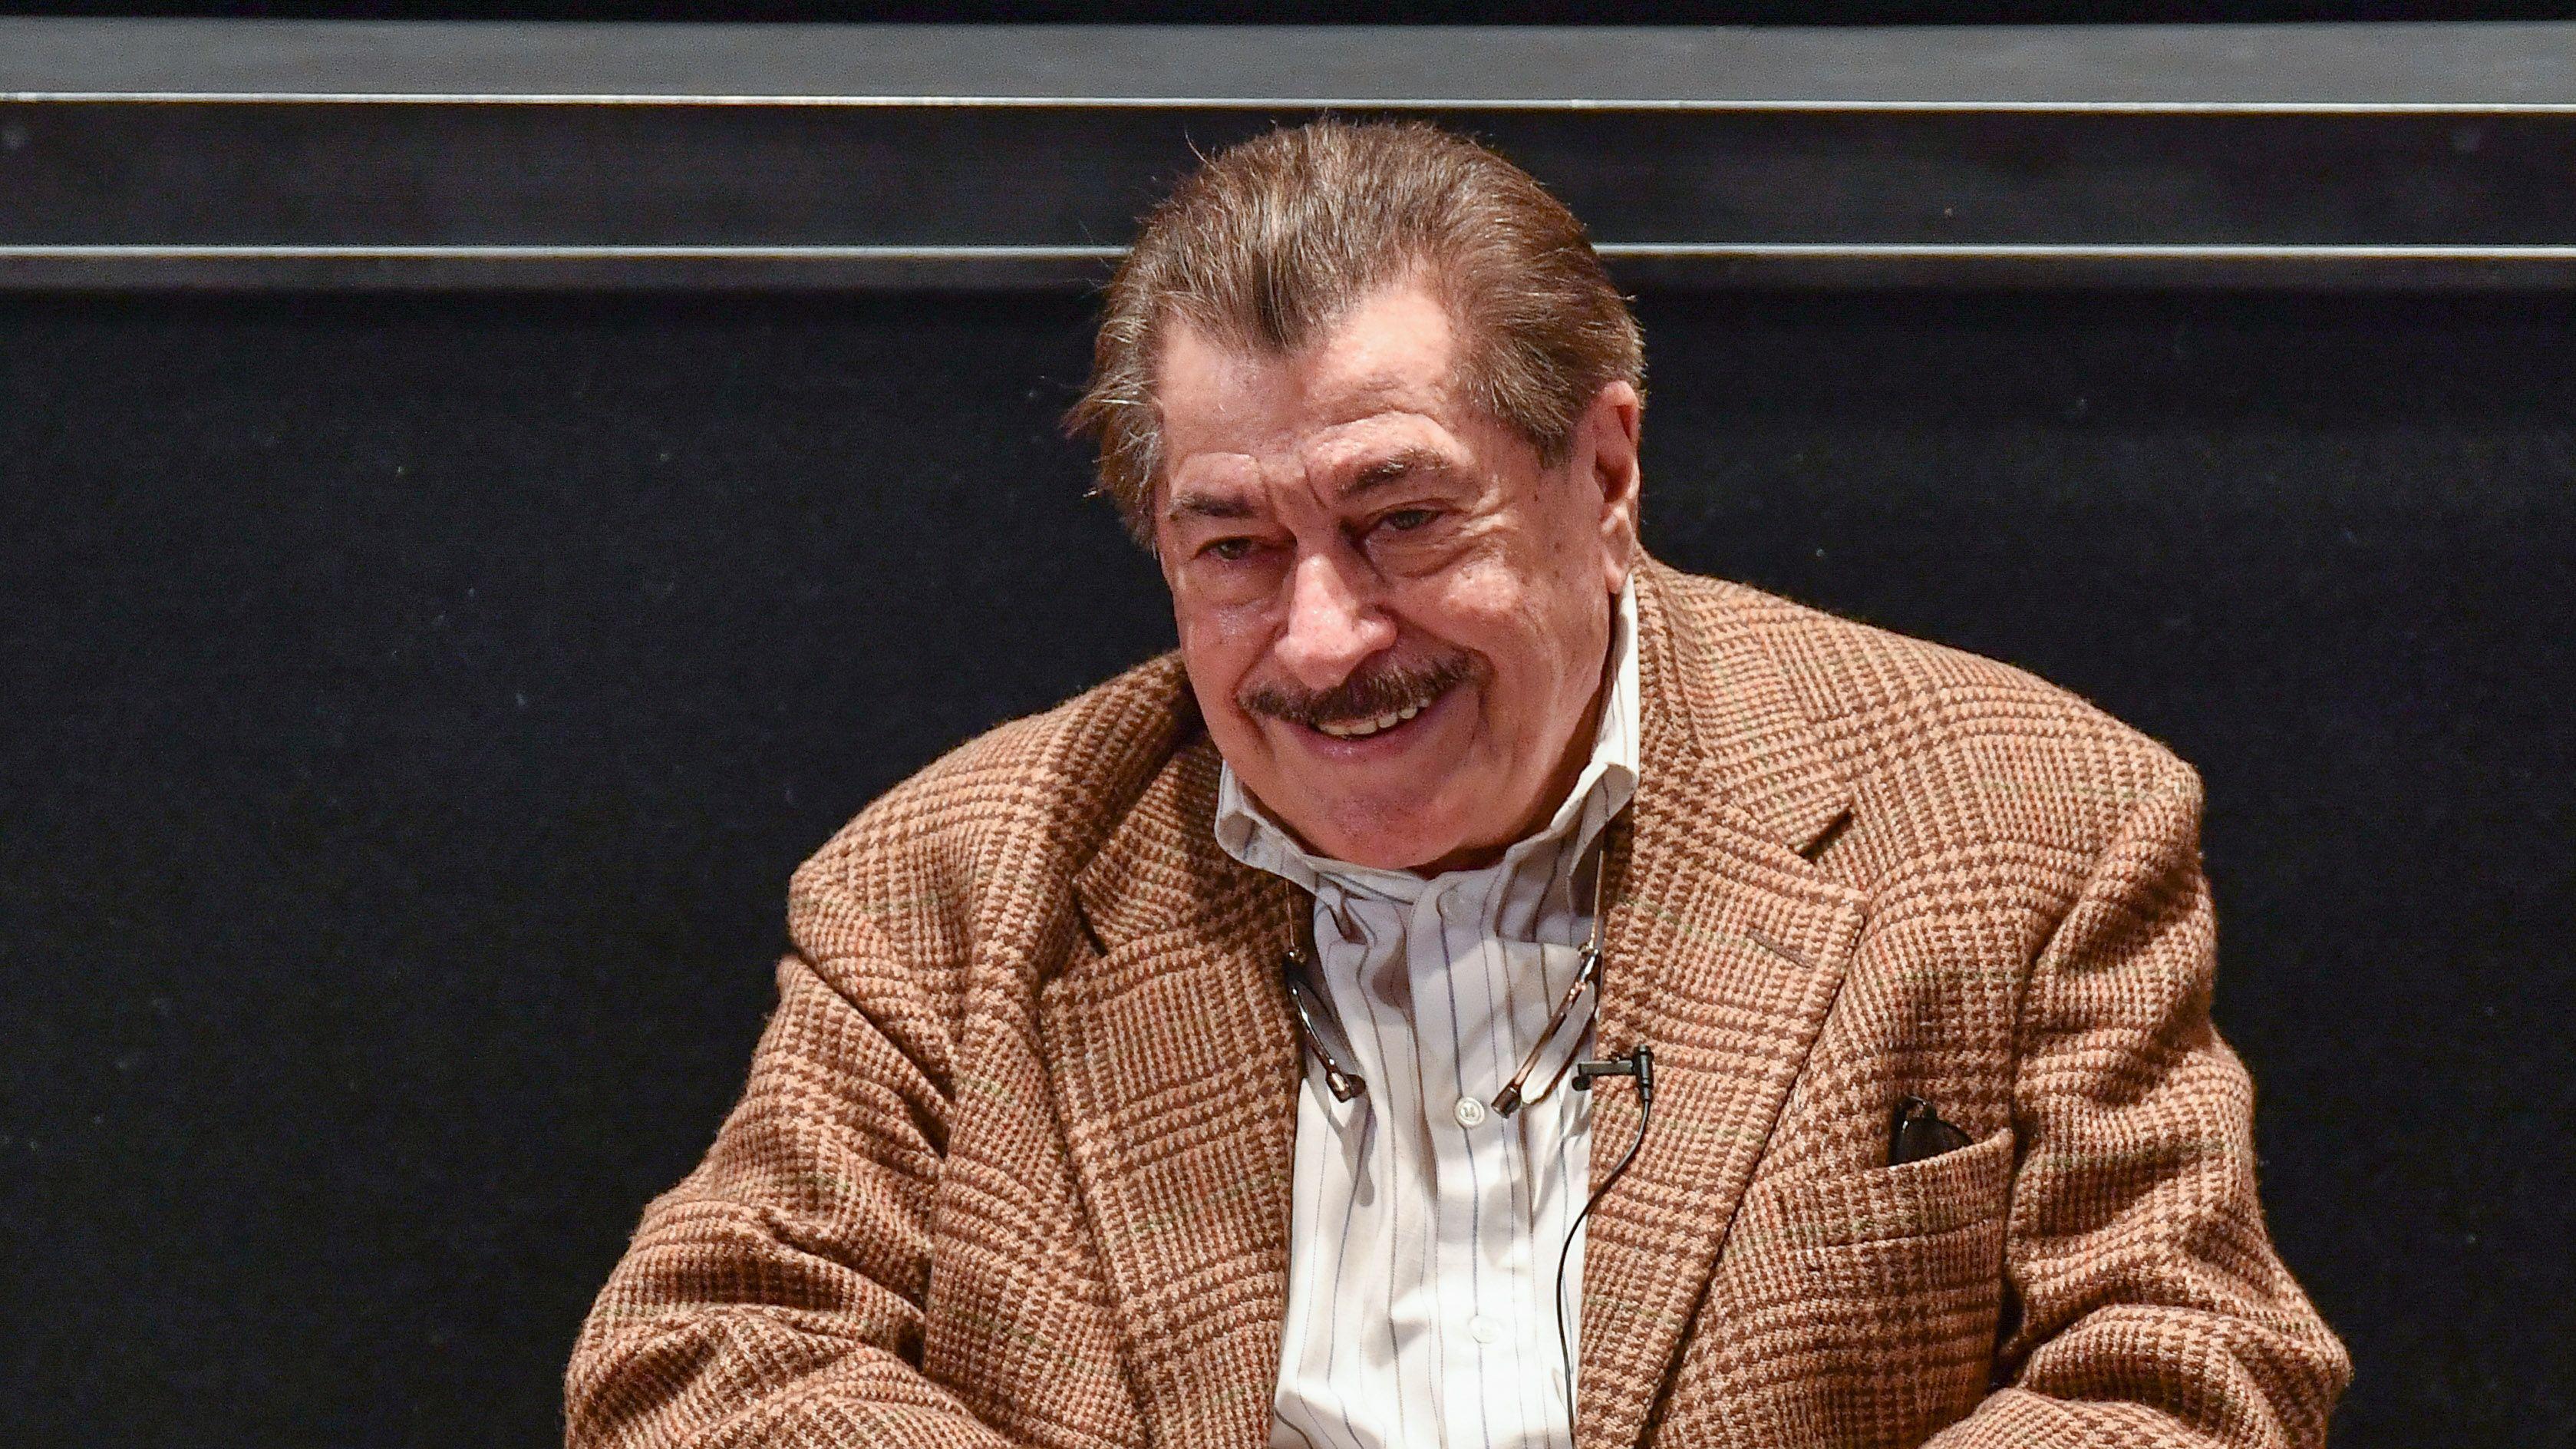 Former HFPA President Jorge Camara Dies at 84